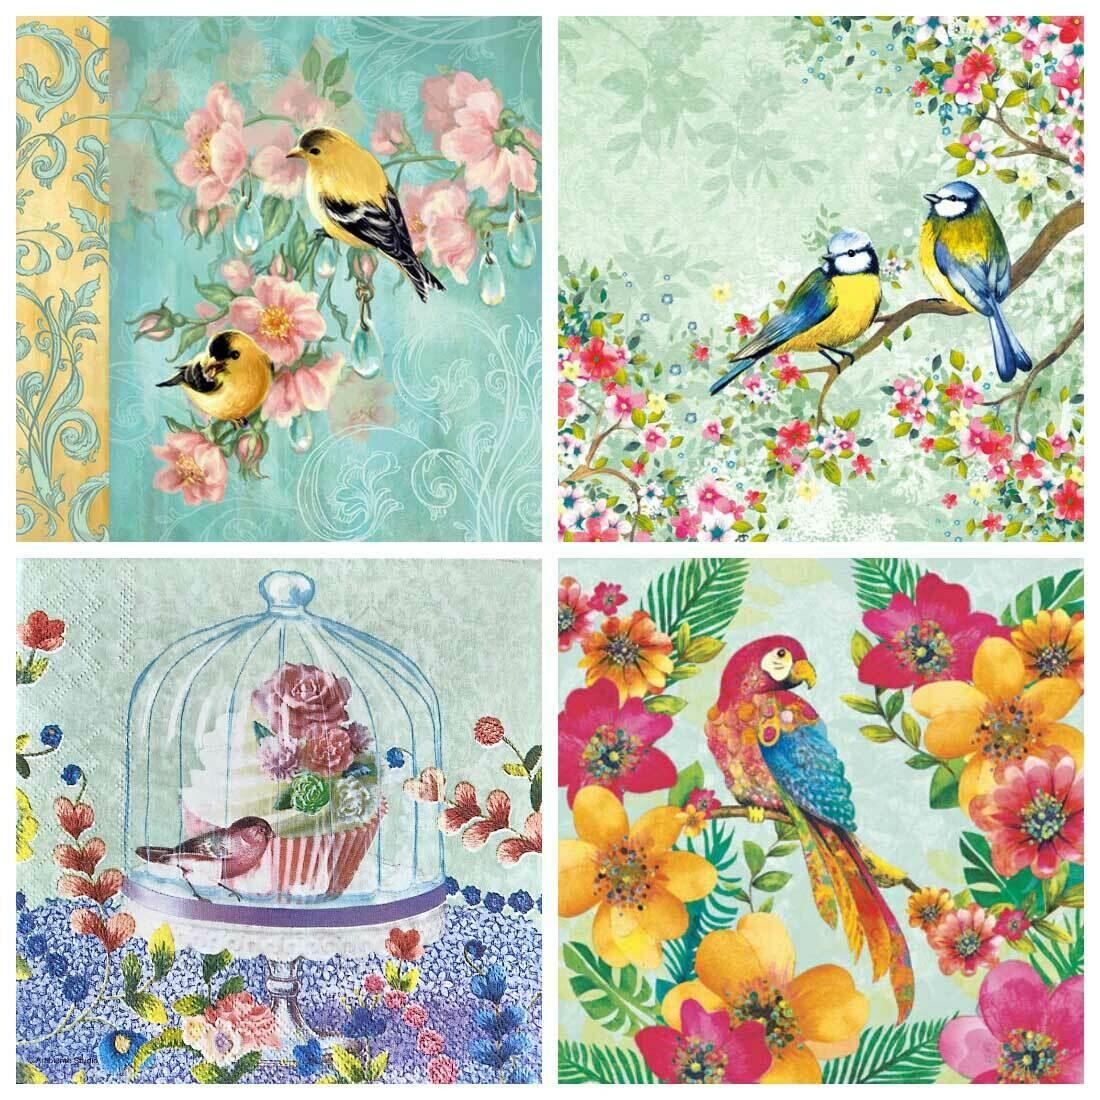 Decoupage Paper Napkins - Bird Print 7G (4 Sheets)